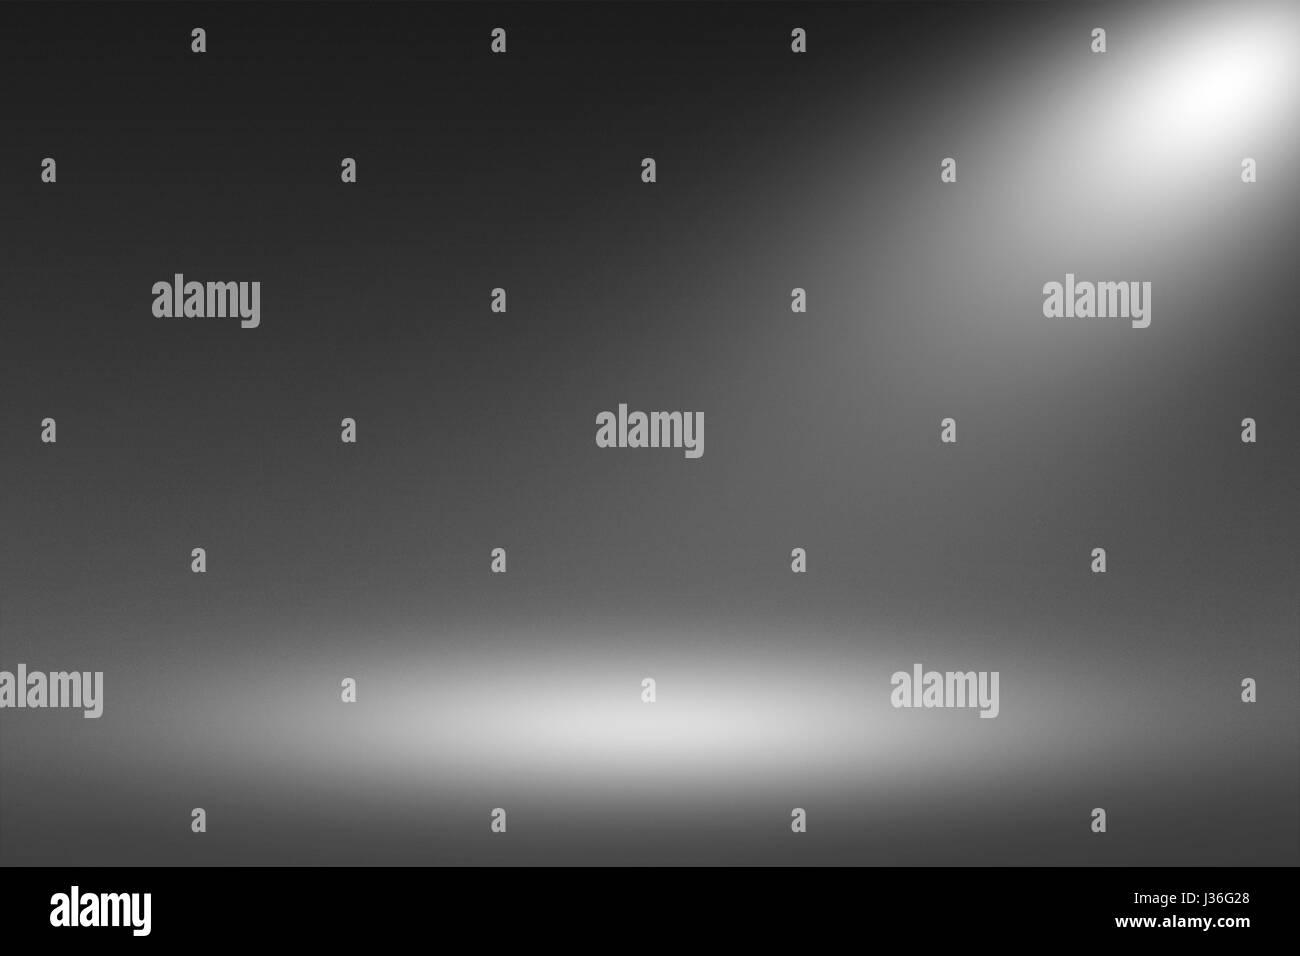 Product Showscase Spotlight on Black Background - Fuzzy Infinite Dark Floor - Stock Image